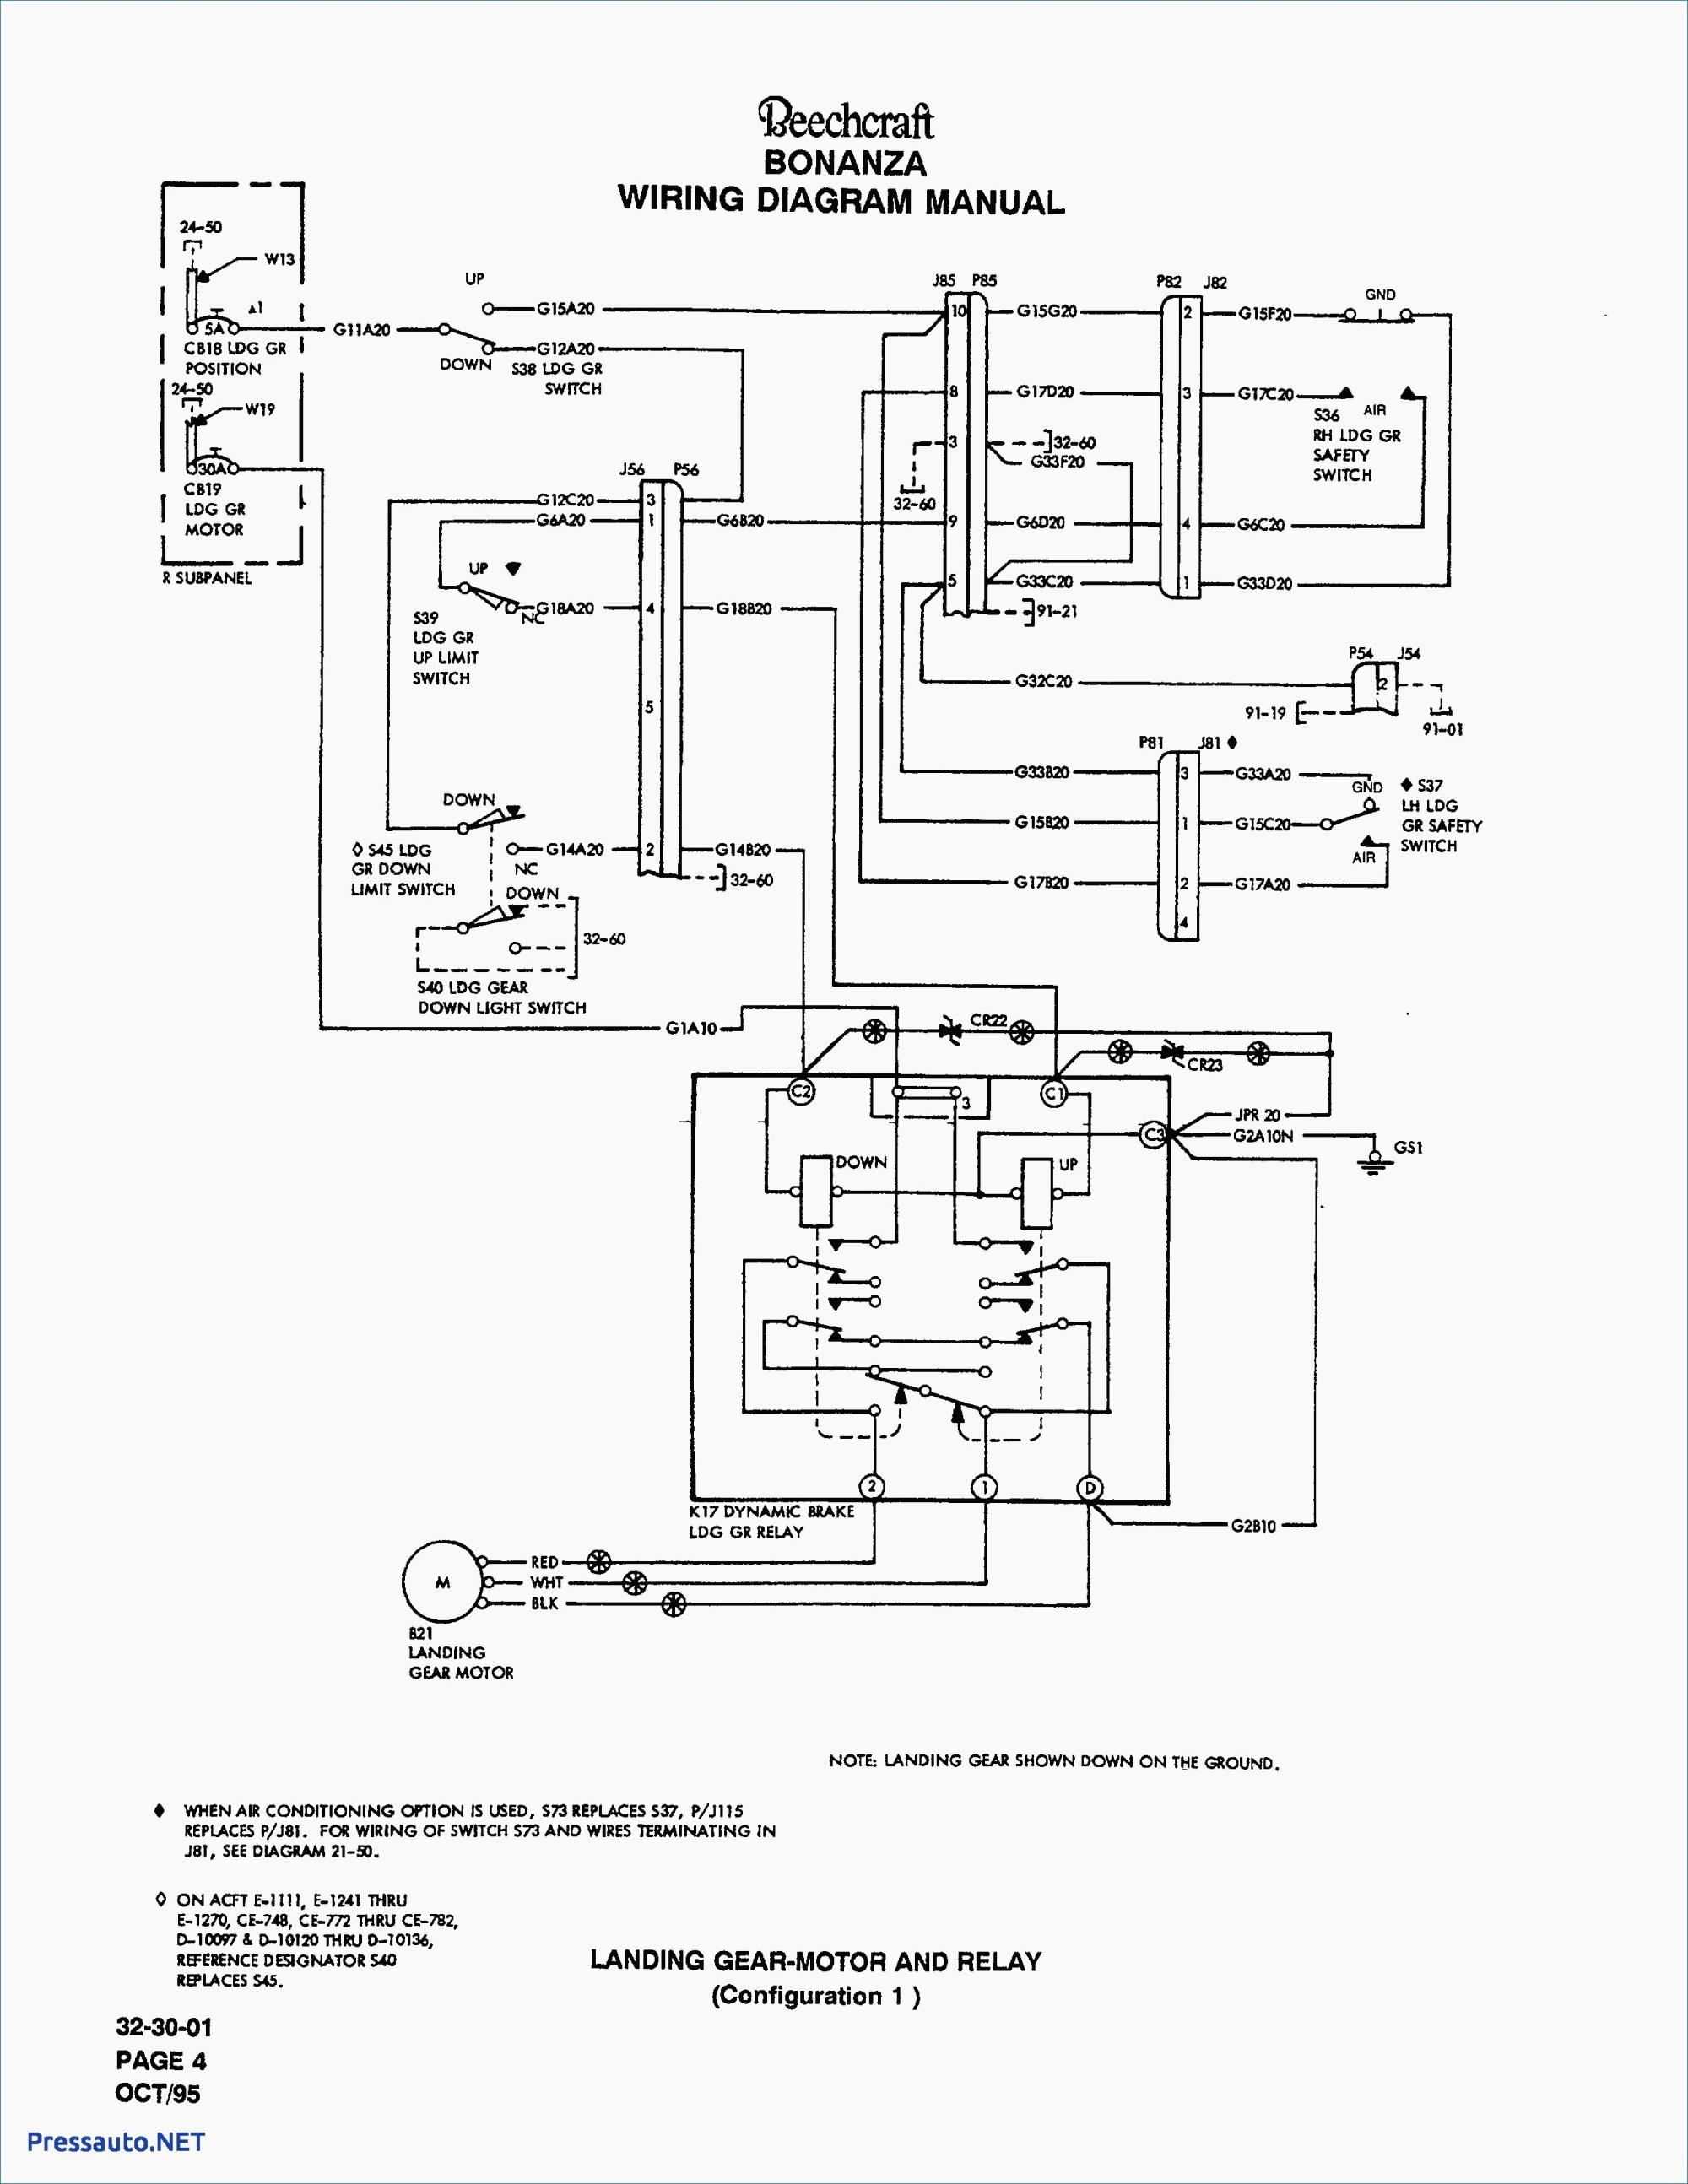 hight resolution of elkhart sidewinder joystick wiring diagram wiring diagram u2022 rh growbyte co 1979 chevy